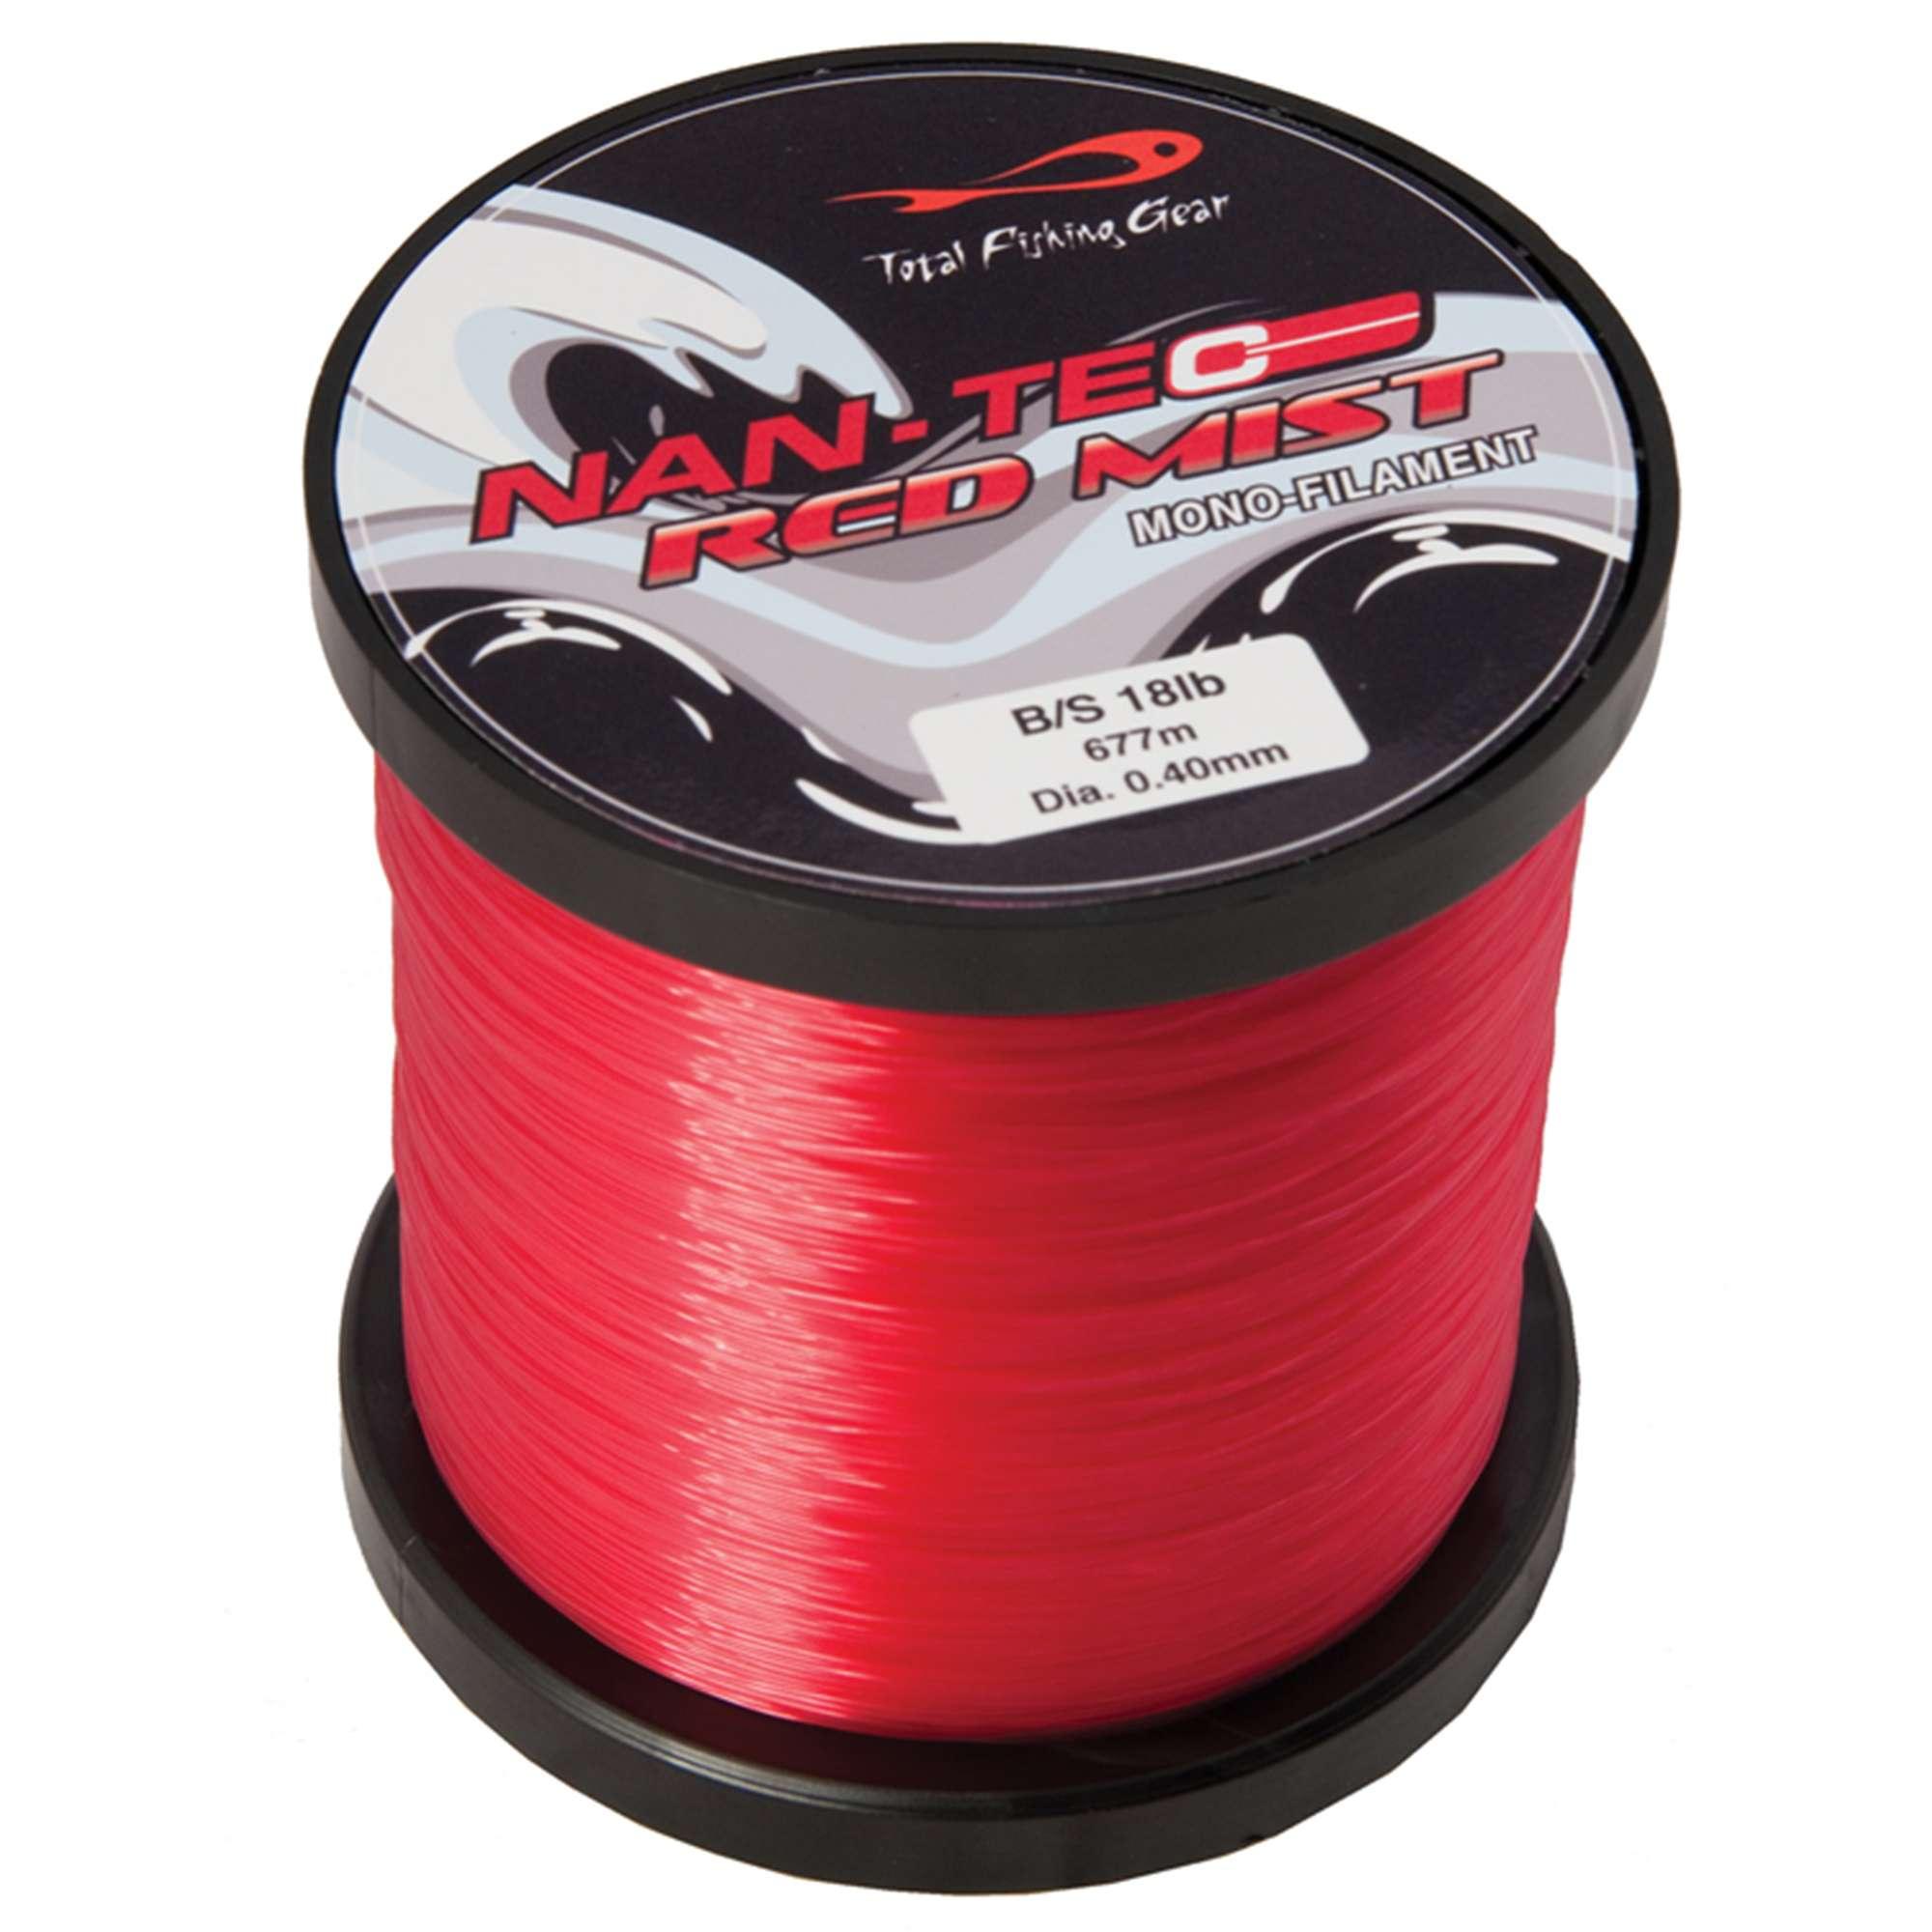 TFG Nan-Tec Red Mist Mono Filament Line 25lb